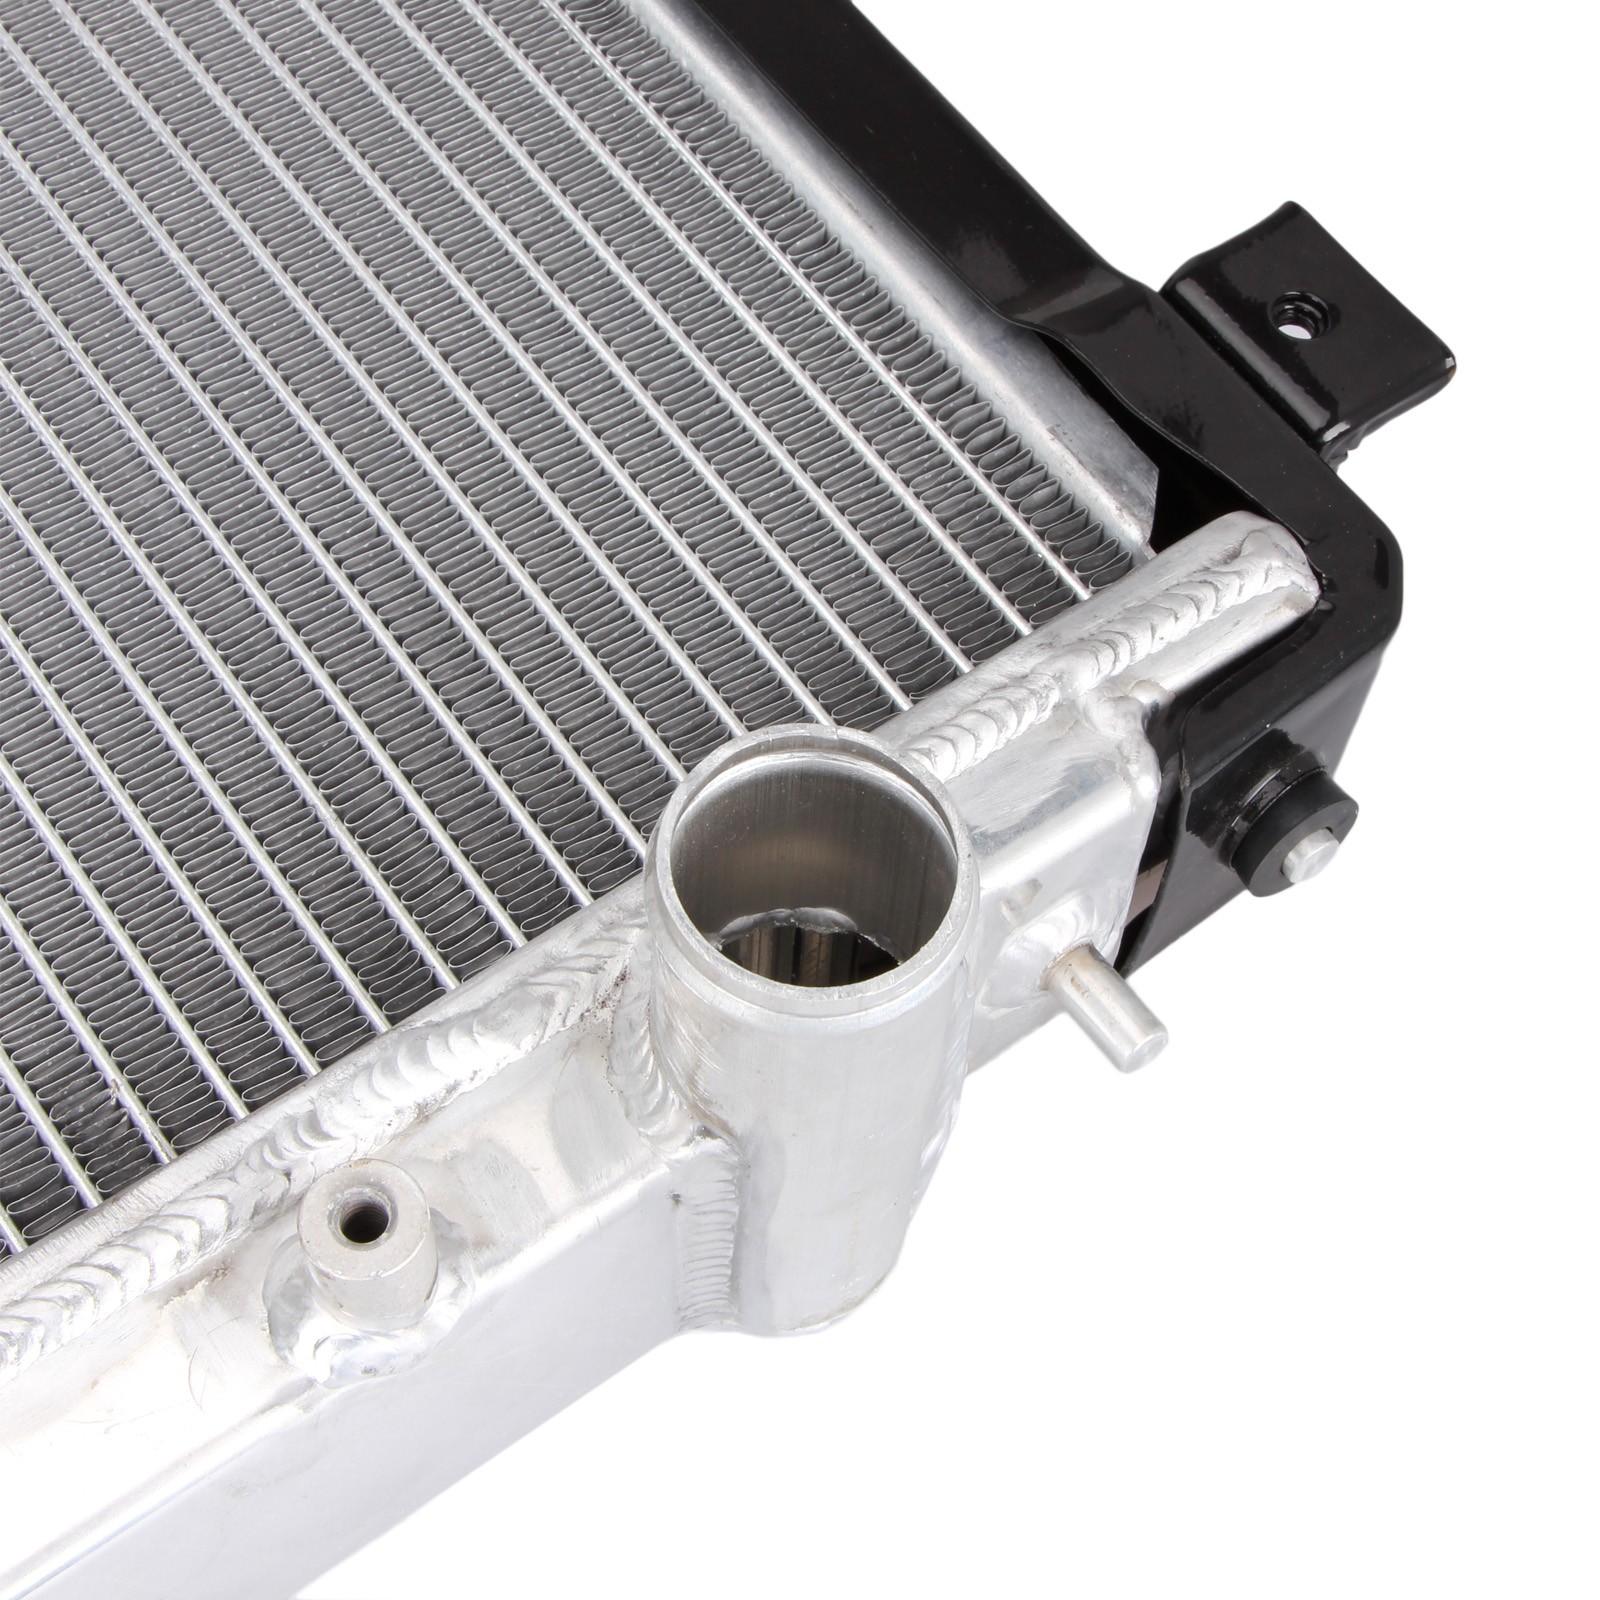 Dromedary-Best Nissan Sentra Radiator Radiator For Nissan Navara D40 Pathfinder R51-4